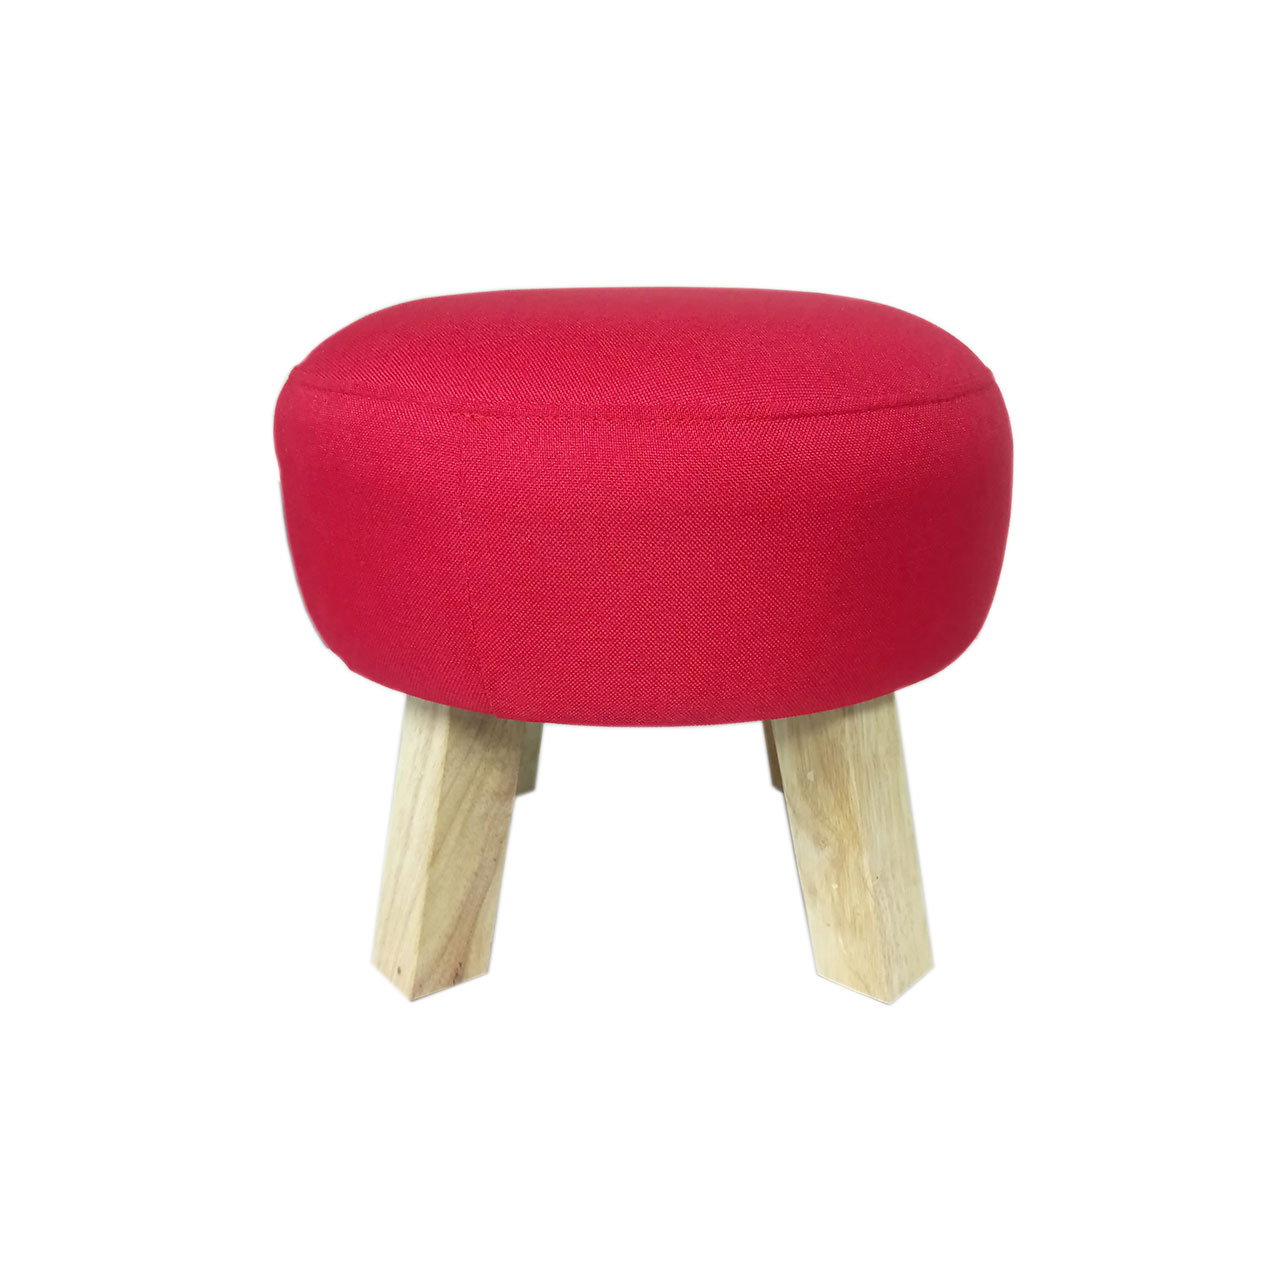 stool chair ph barrel slipcover ophie furniture store manila philippines urban